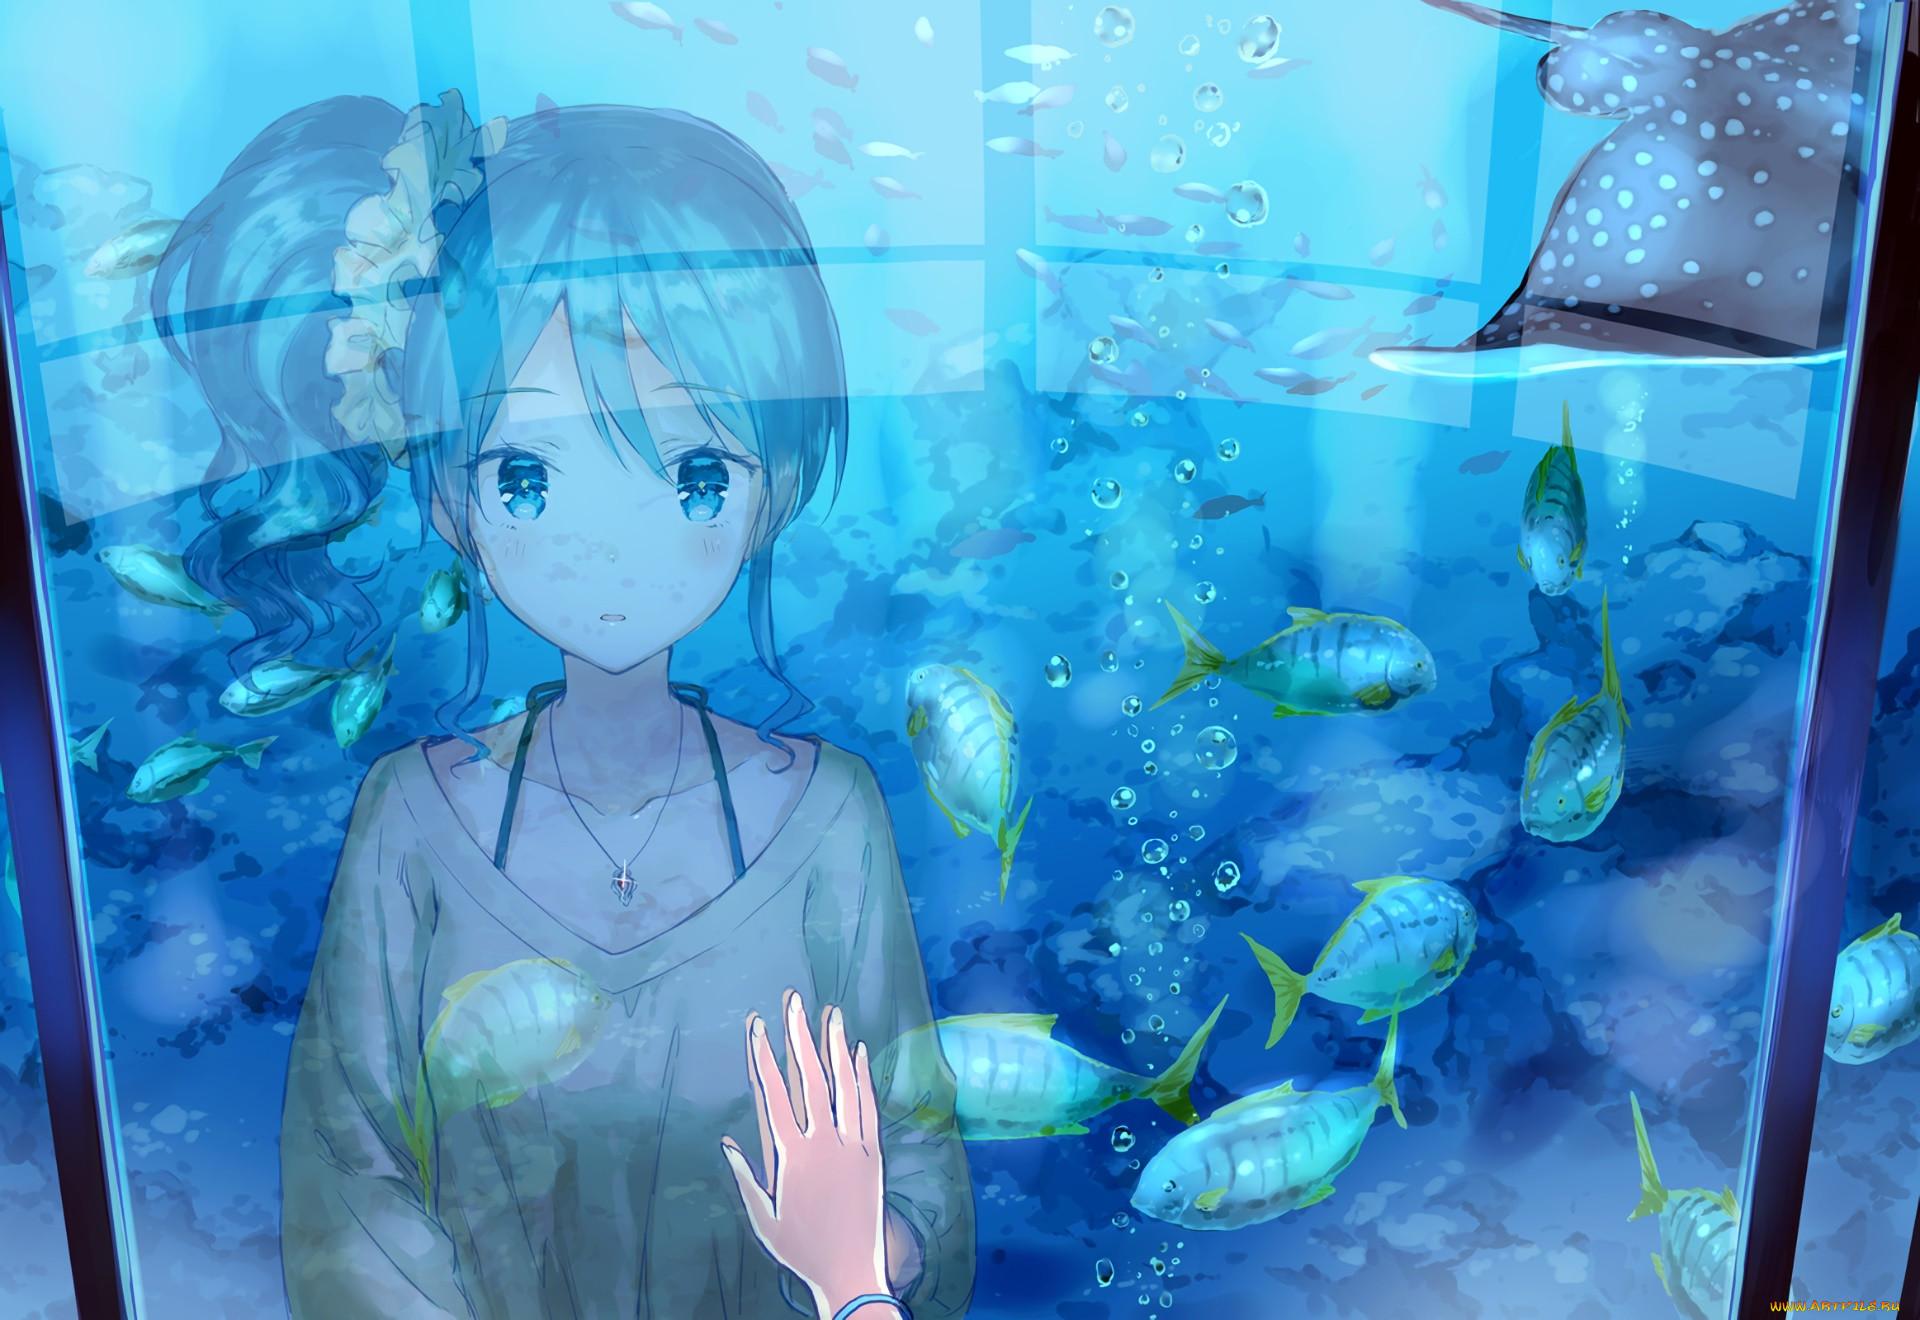 aikatsu, аниме, взгляд, девушка, фон